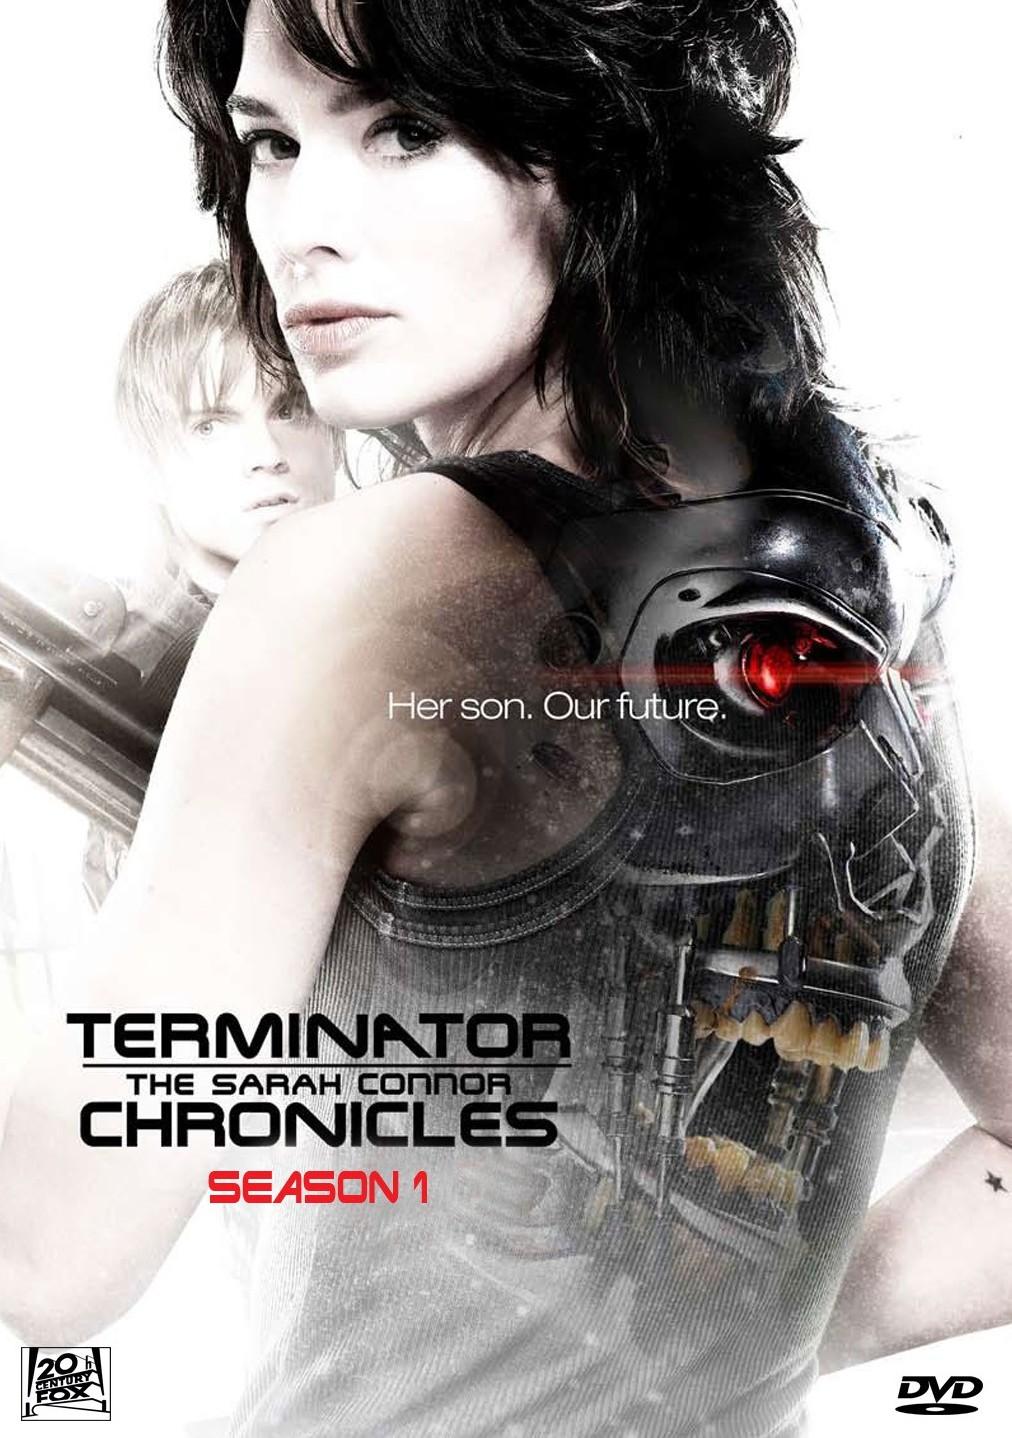 http://4.bp.blogspot.com/-CNX9WtQM1cw/Tn71GrC70rI/AAAAAAAABB0/hifxA7wd9KA/s1600/Terminator+The+Sarah+Connor+Chronicles++Season+1_1.jpg